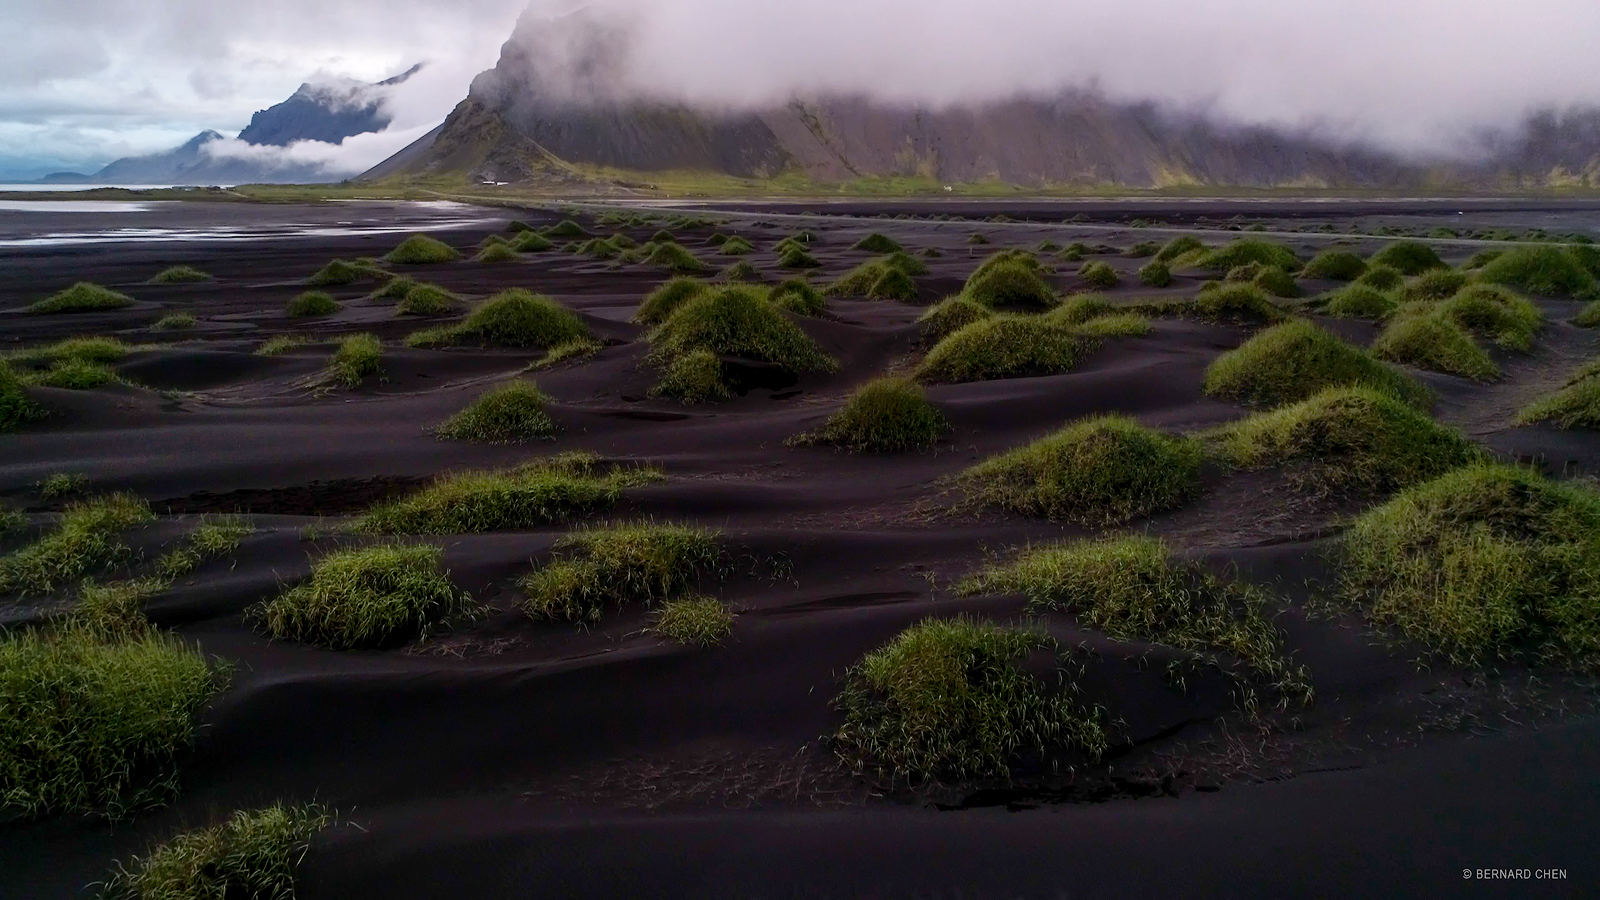 Iceland, Jokulsarlon, Vestrahorn, Ice Beach, Iceberg, Black Sand, Waves, Motion, Water Motion, Sunset, Cloudy, Bernard Chen...